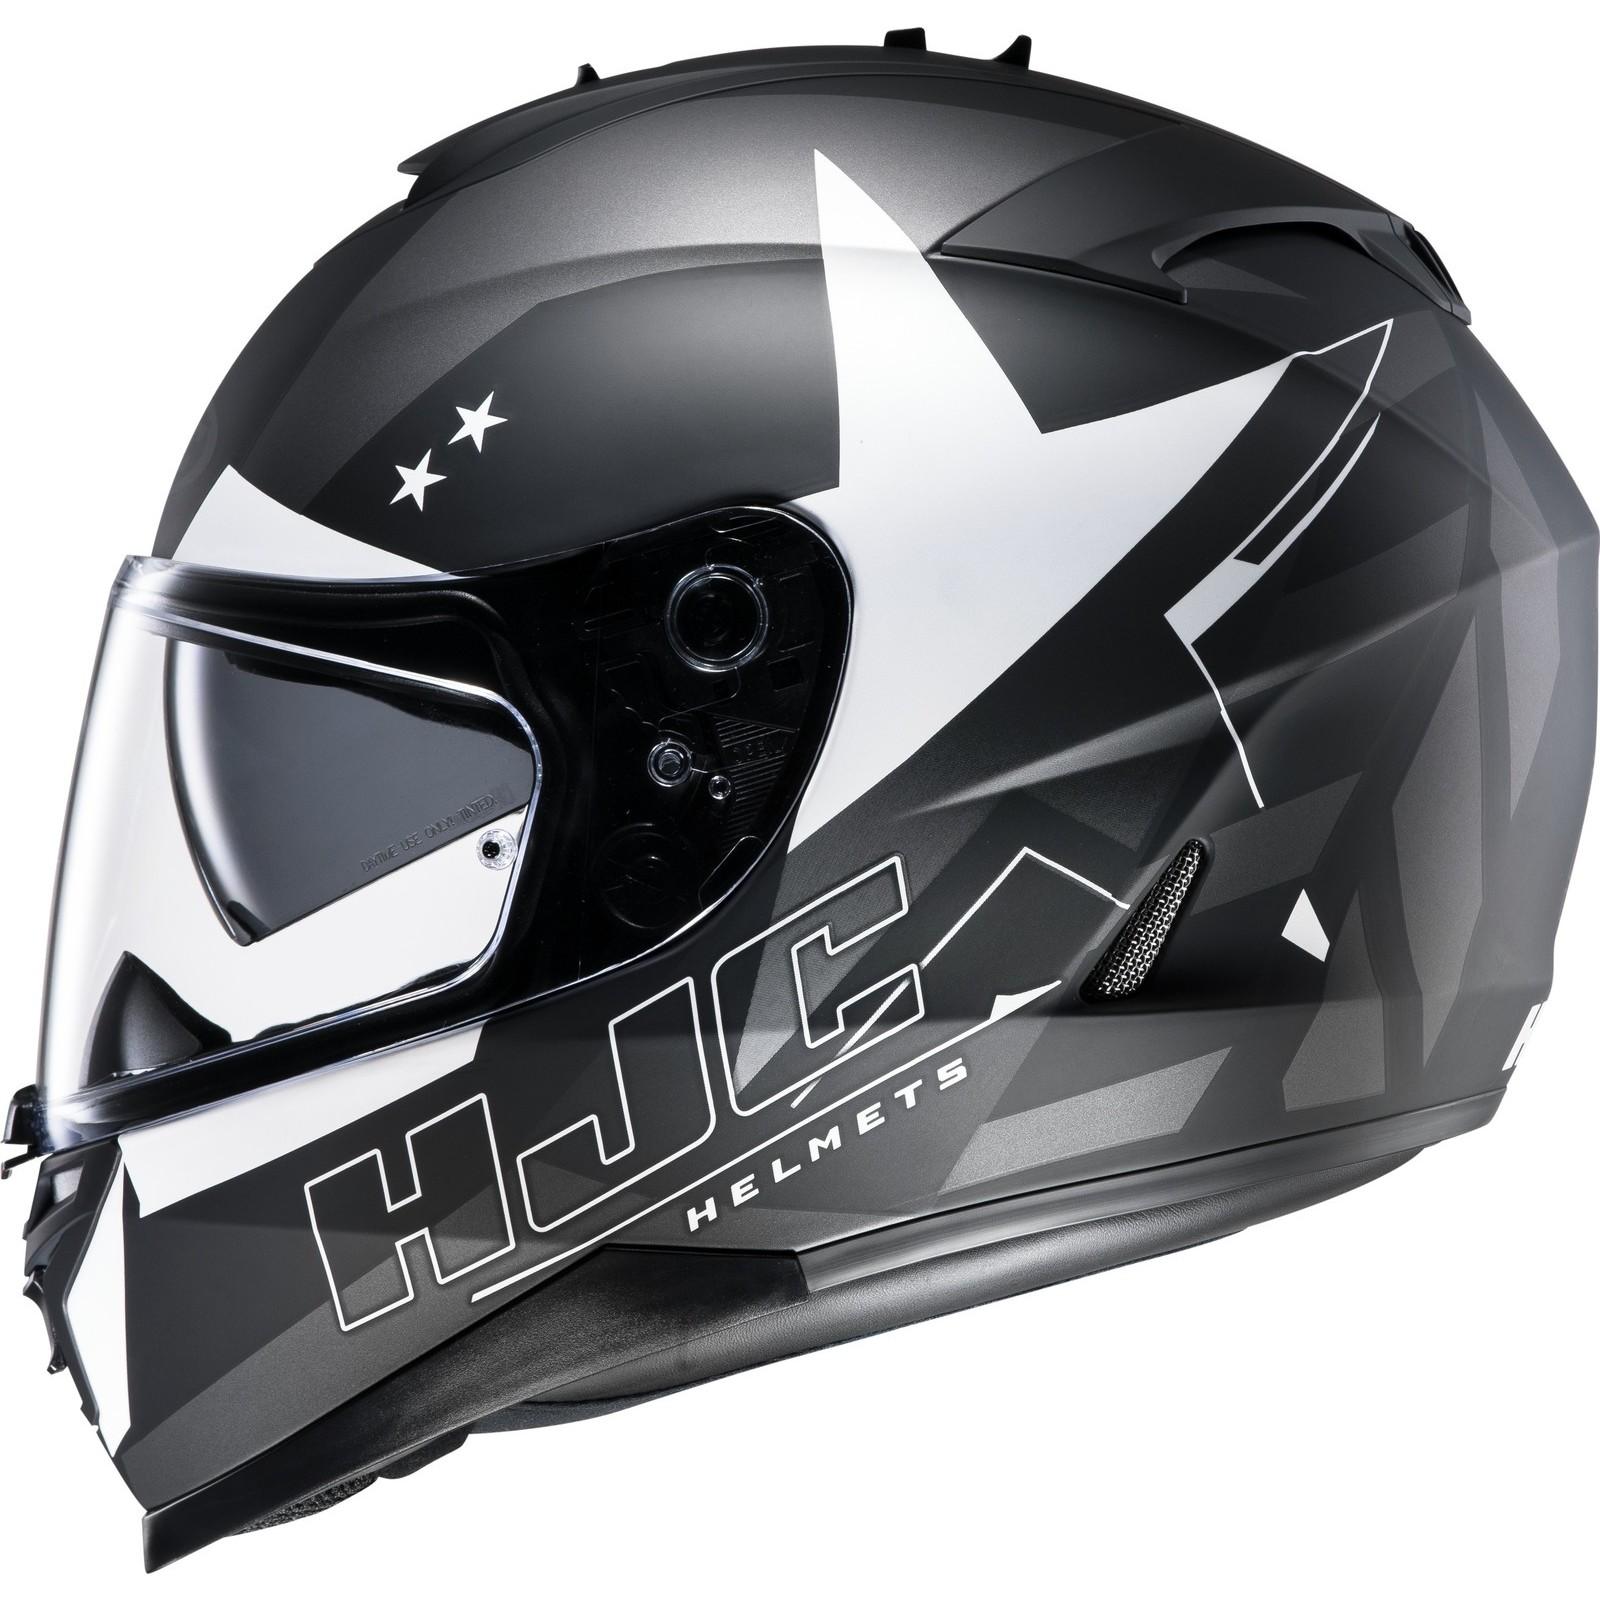 hjc is 17 armada motorcycle helmet inner sun visor. Black Bedroom Furniture Sets. Home Design Ideas